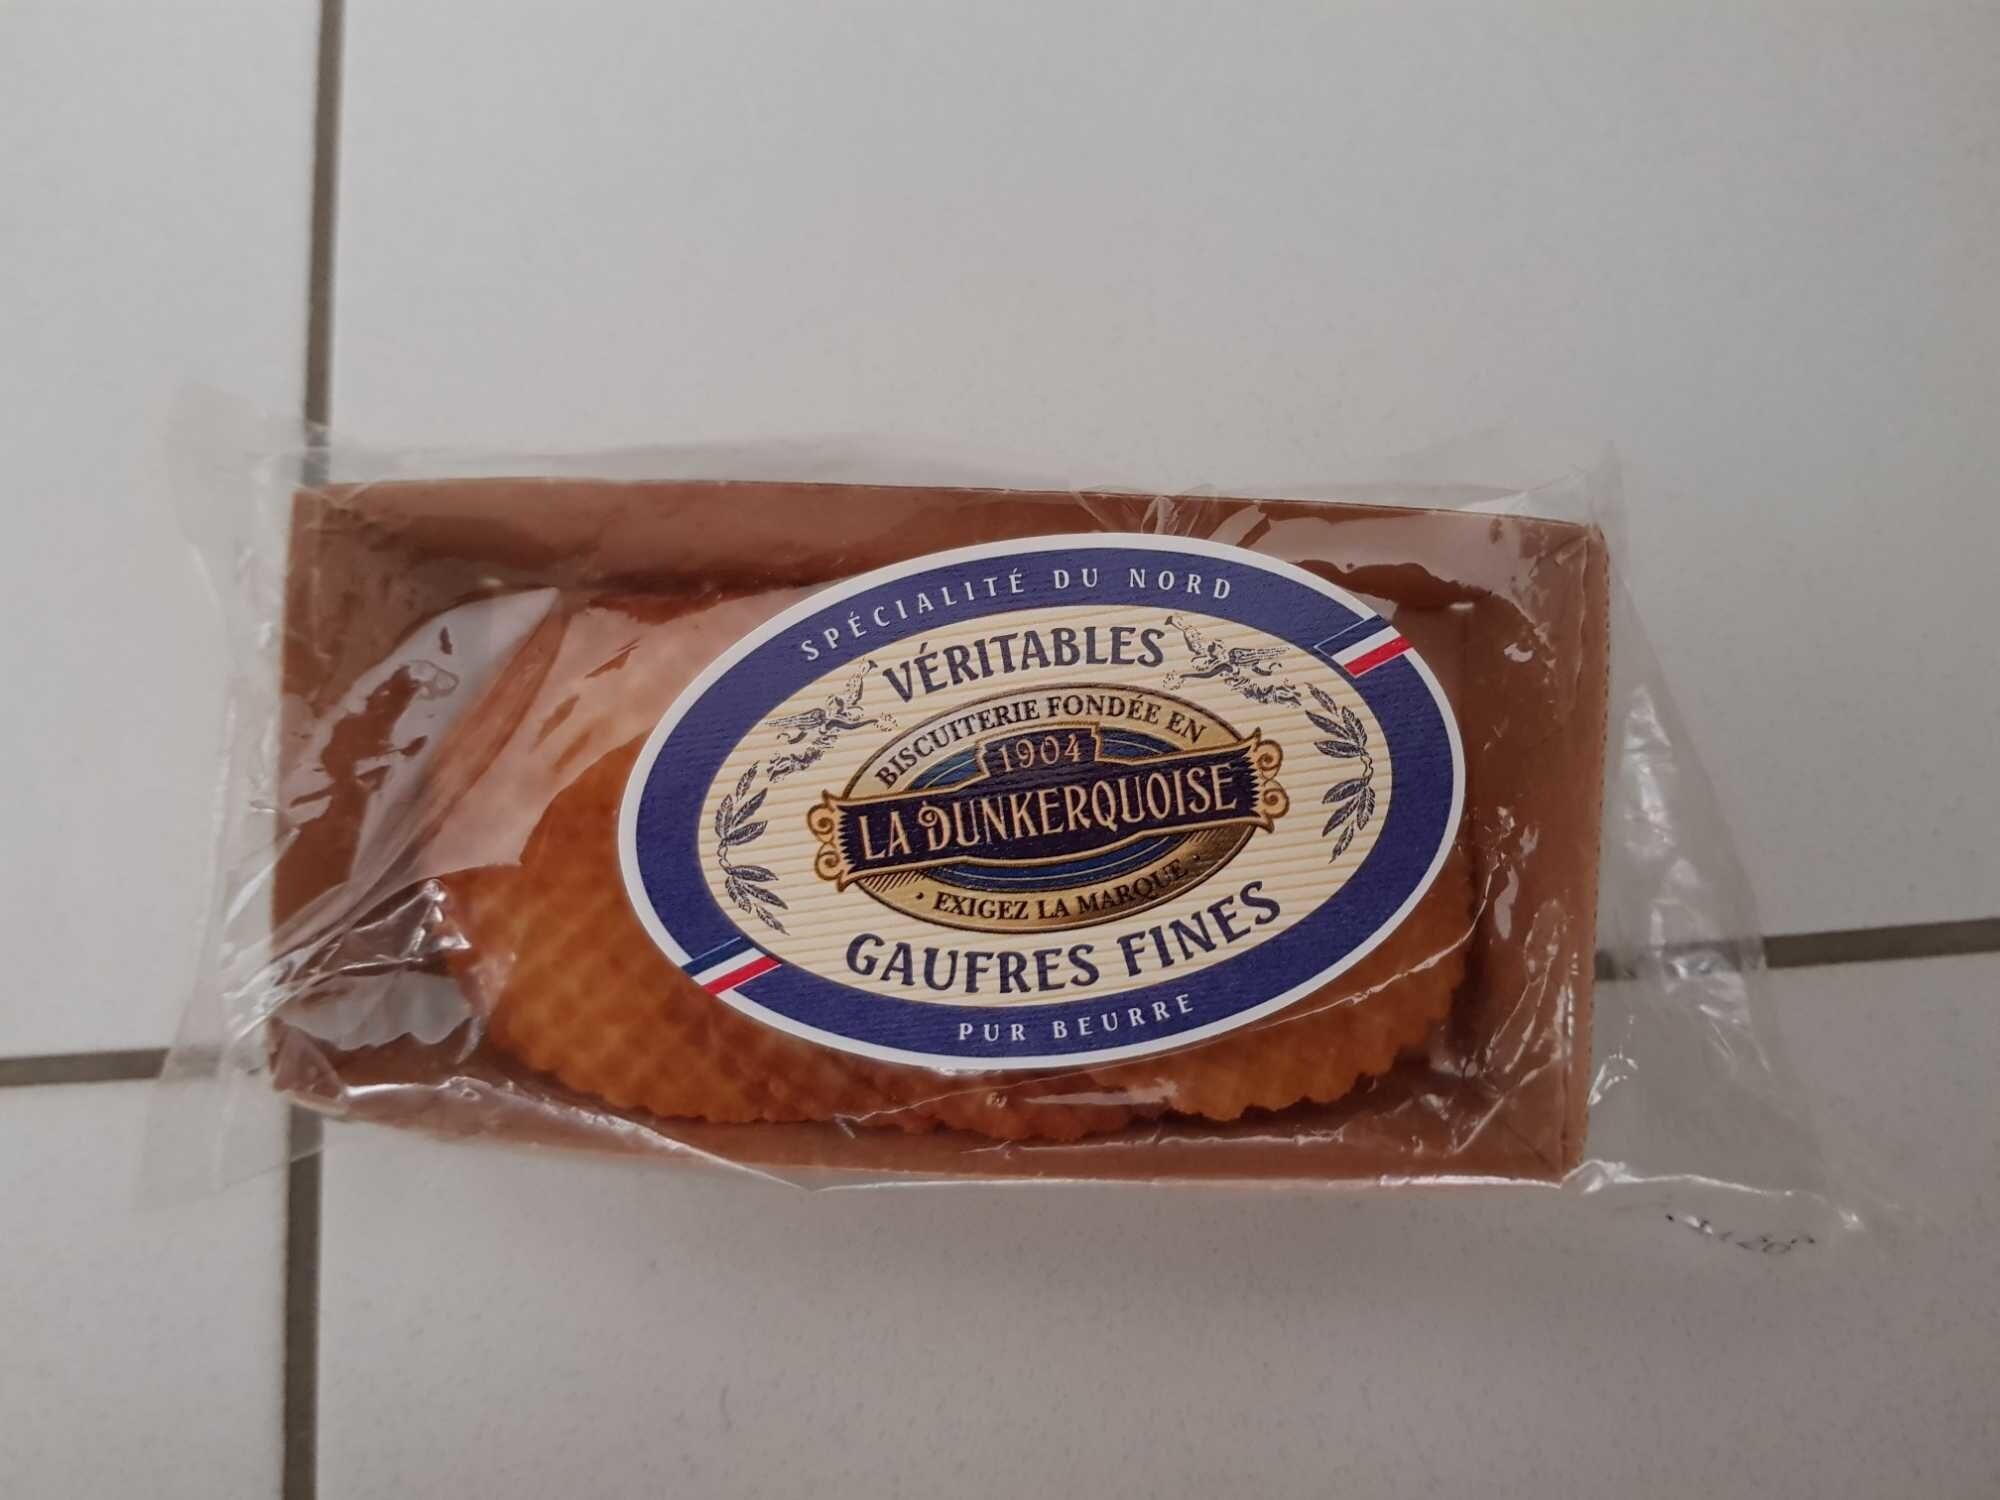 Gaufres fines pour beurre - Ingredients - fr